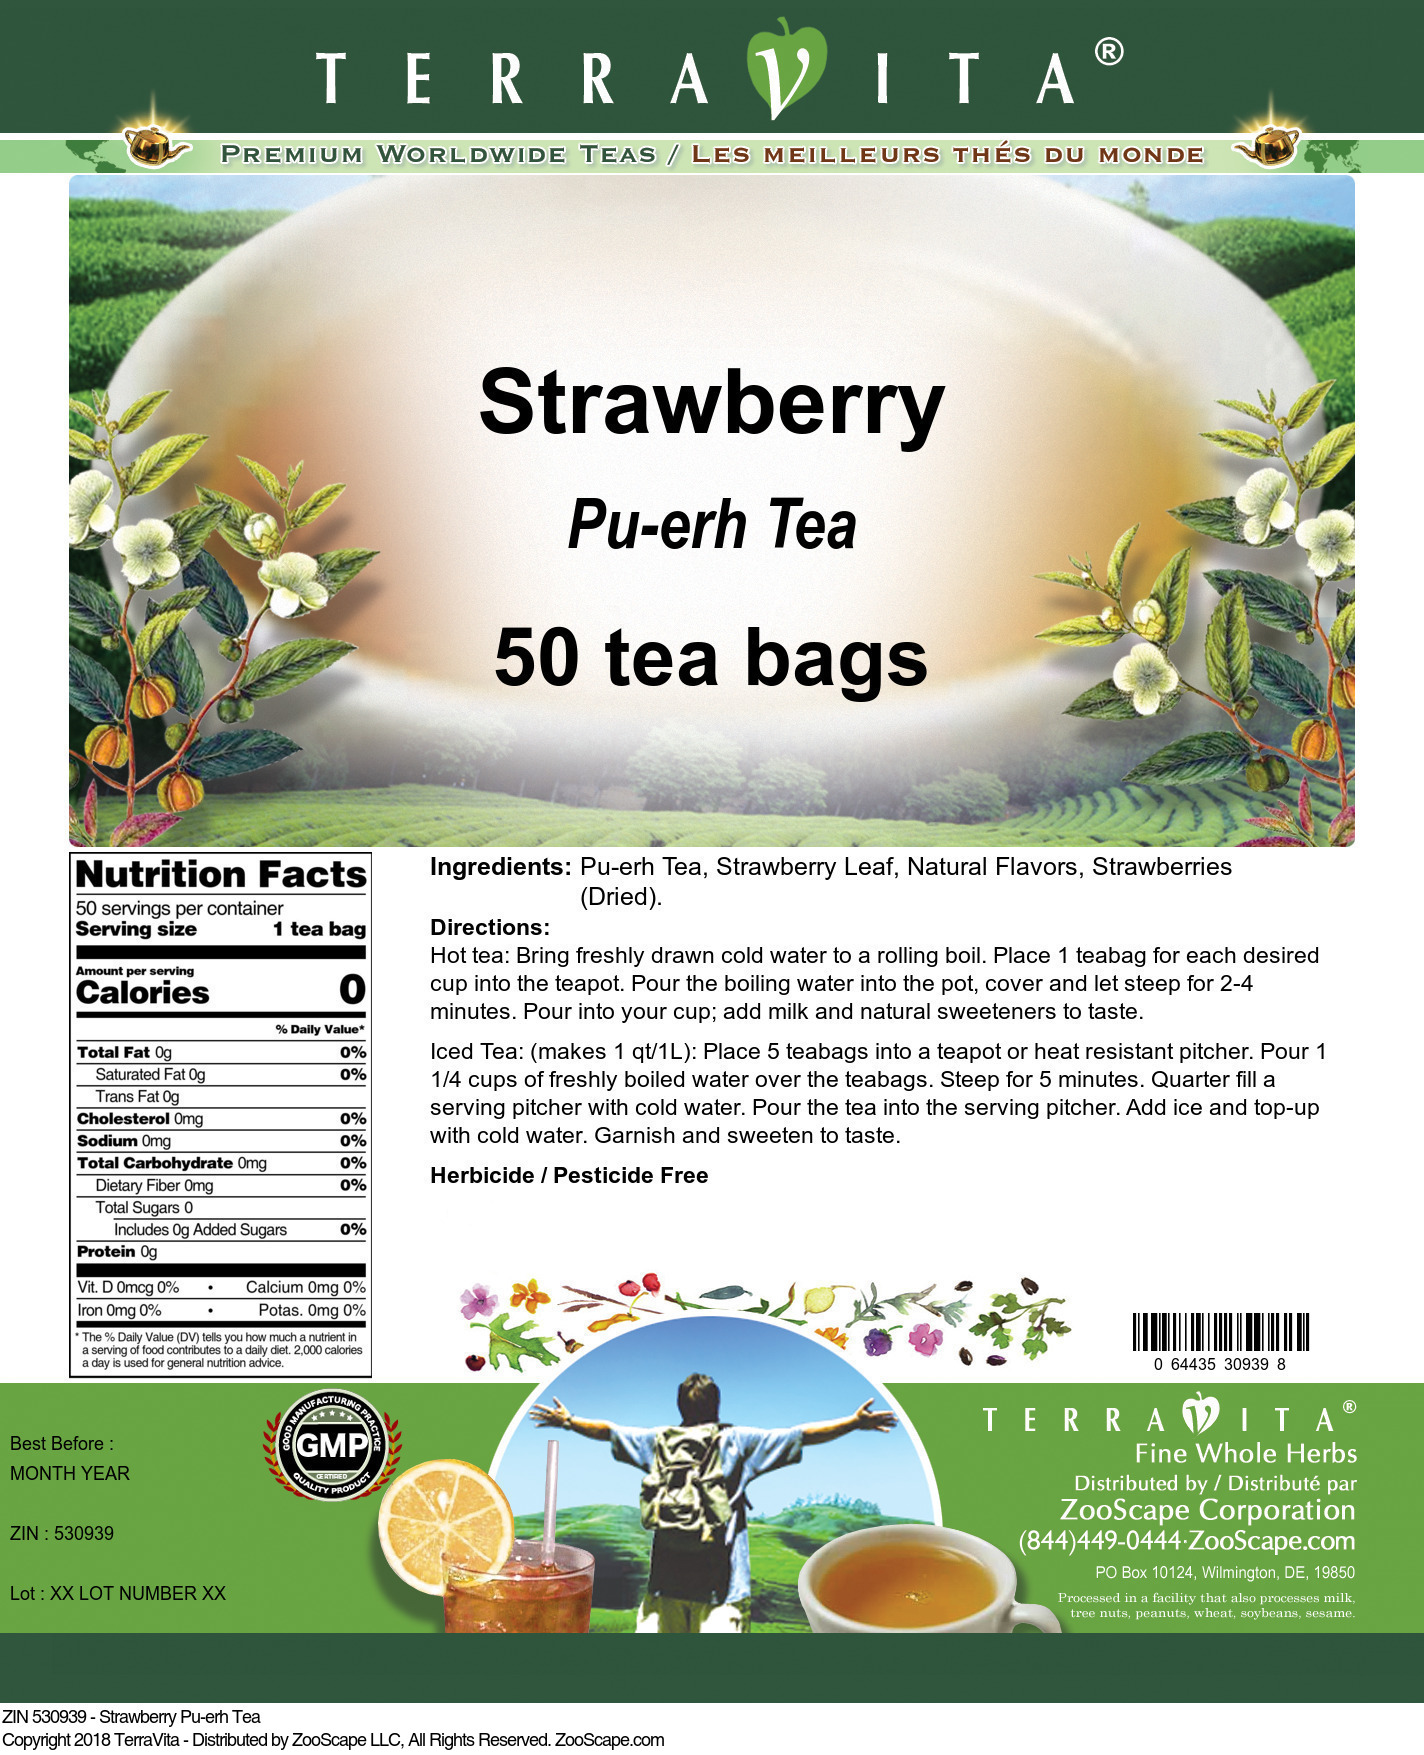 Strawberry Pu-erh Tea